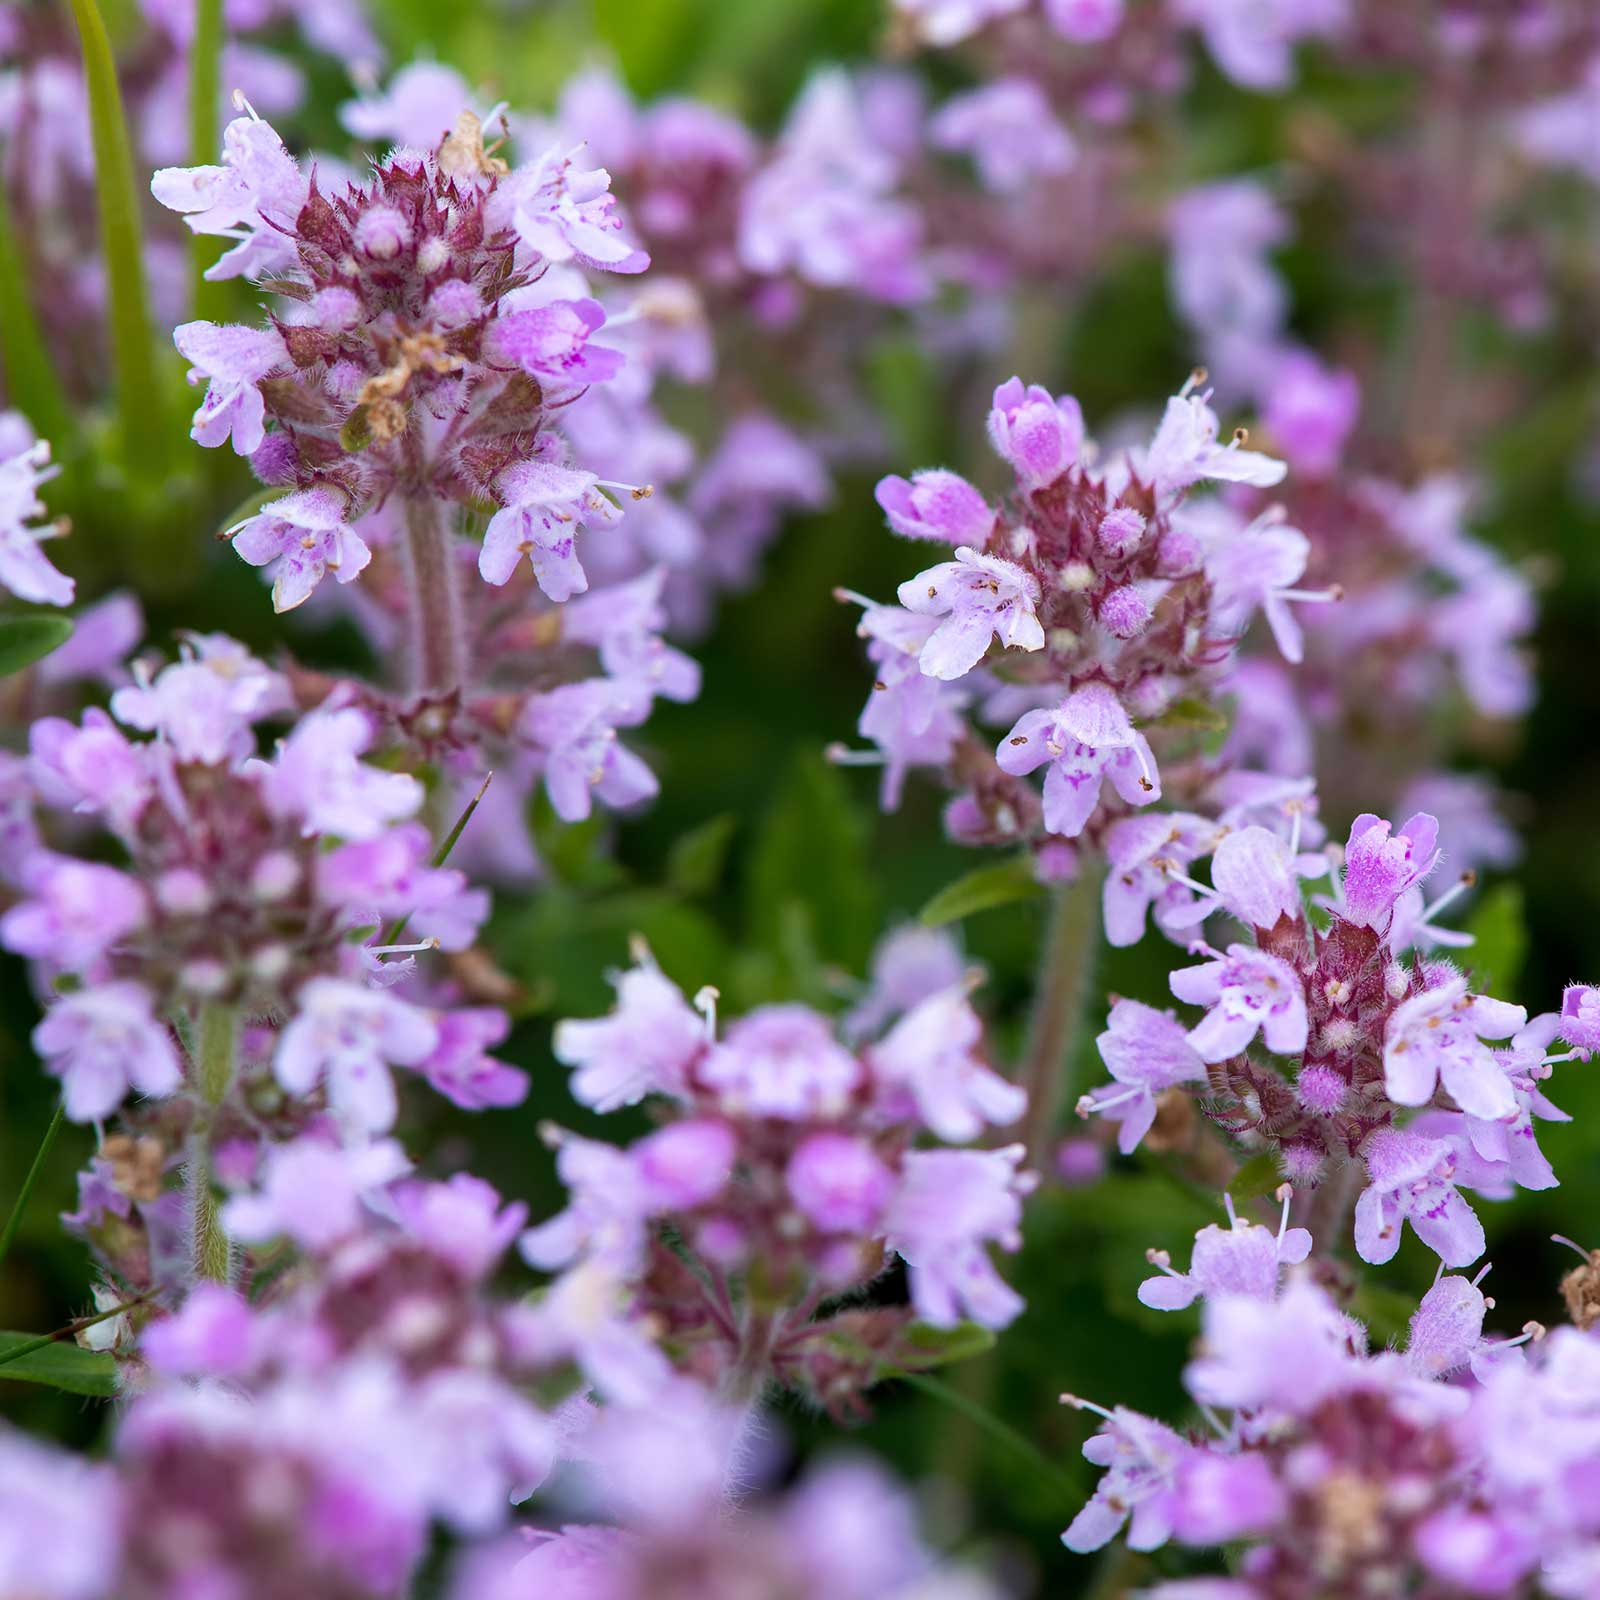 Creeping Thyme Flower Seeds 1 Lb Bulk Perennial Flower Gardening